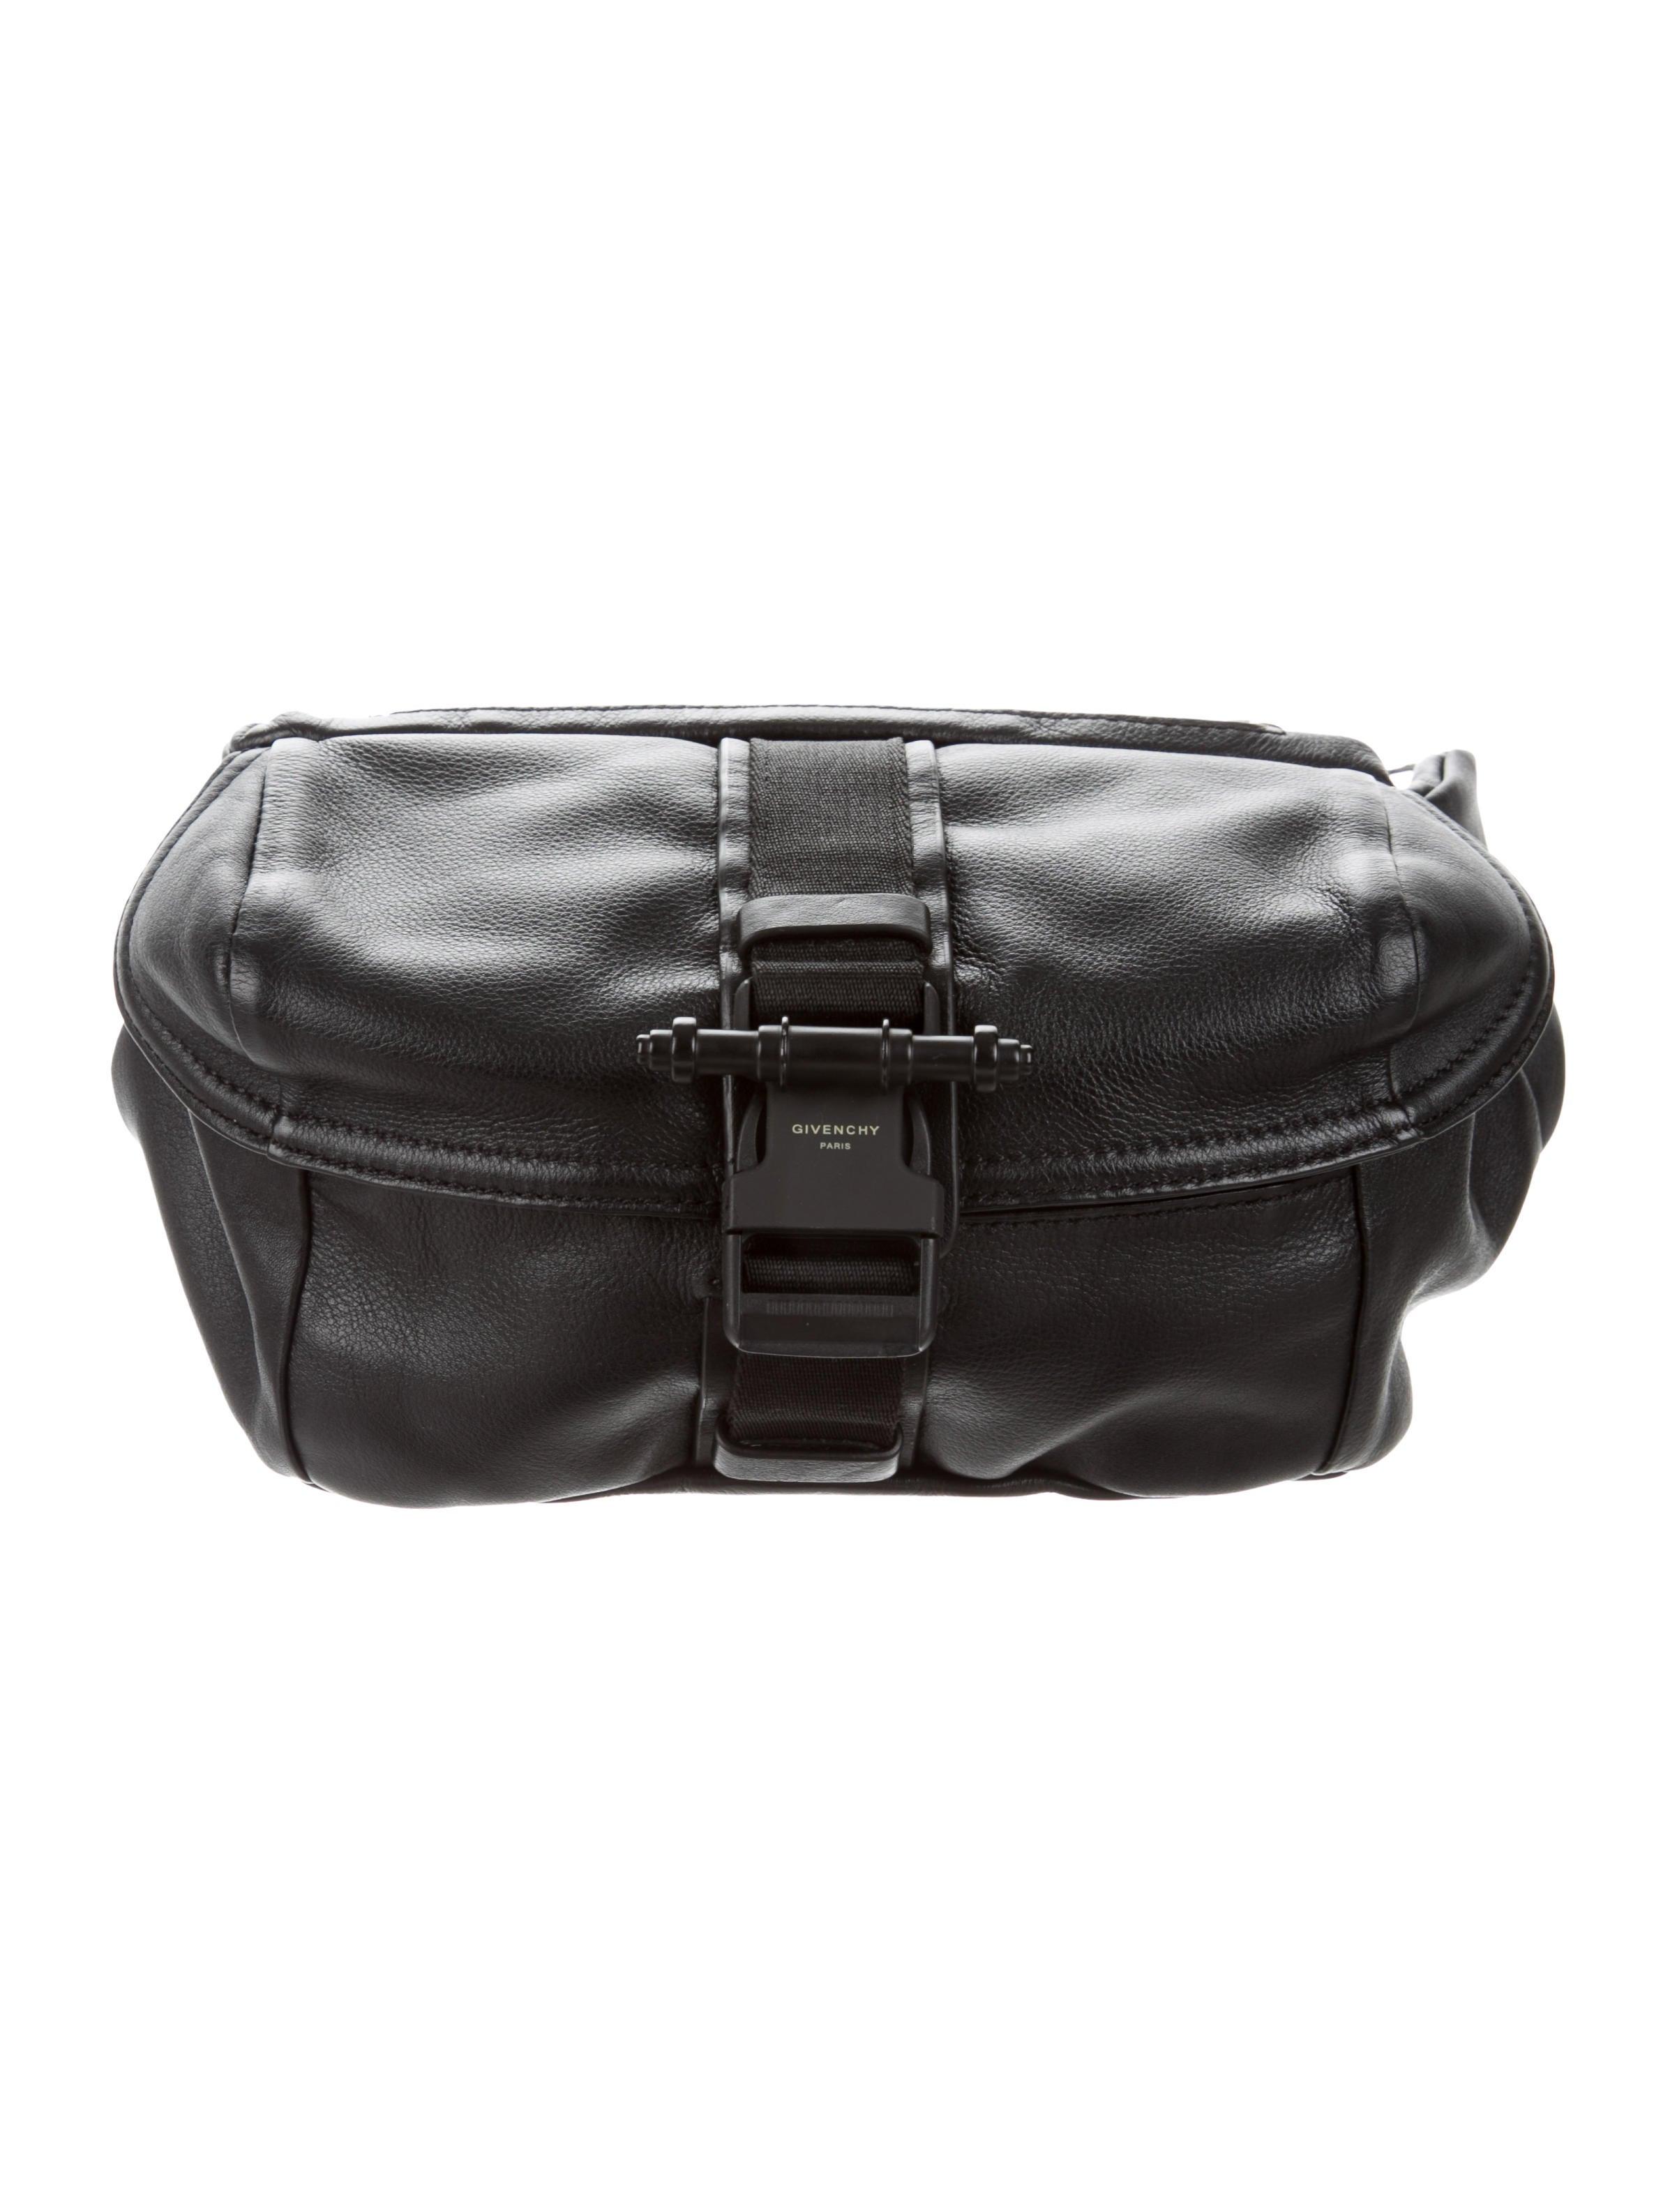 Givenchy Obsedia Bum Bag - Bags - GIV54011  c2a7c78dfdab6